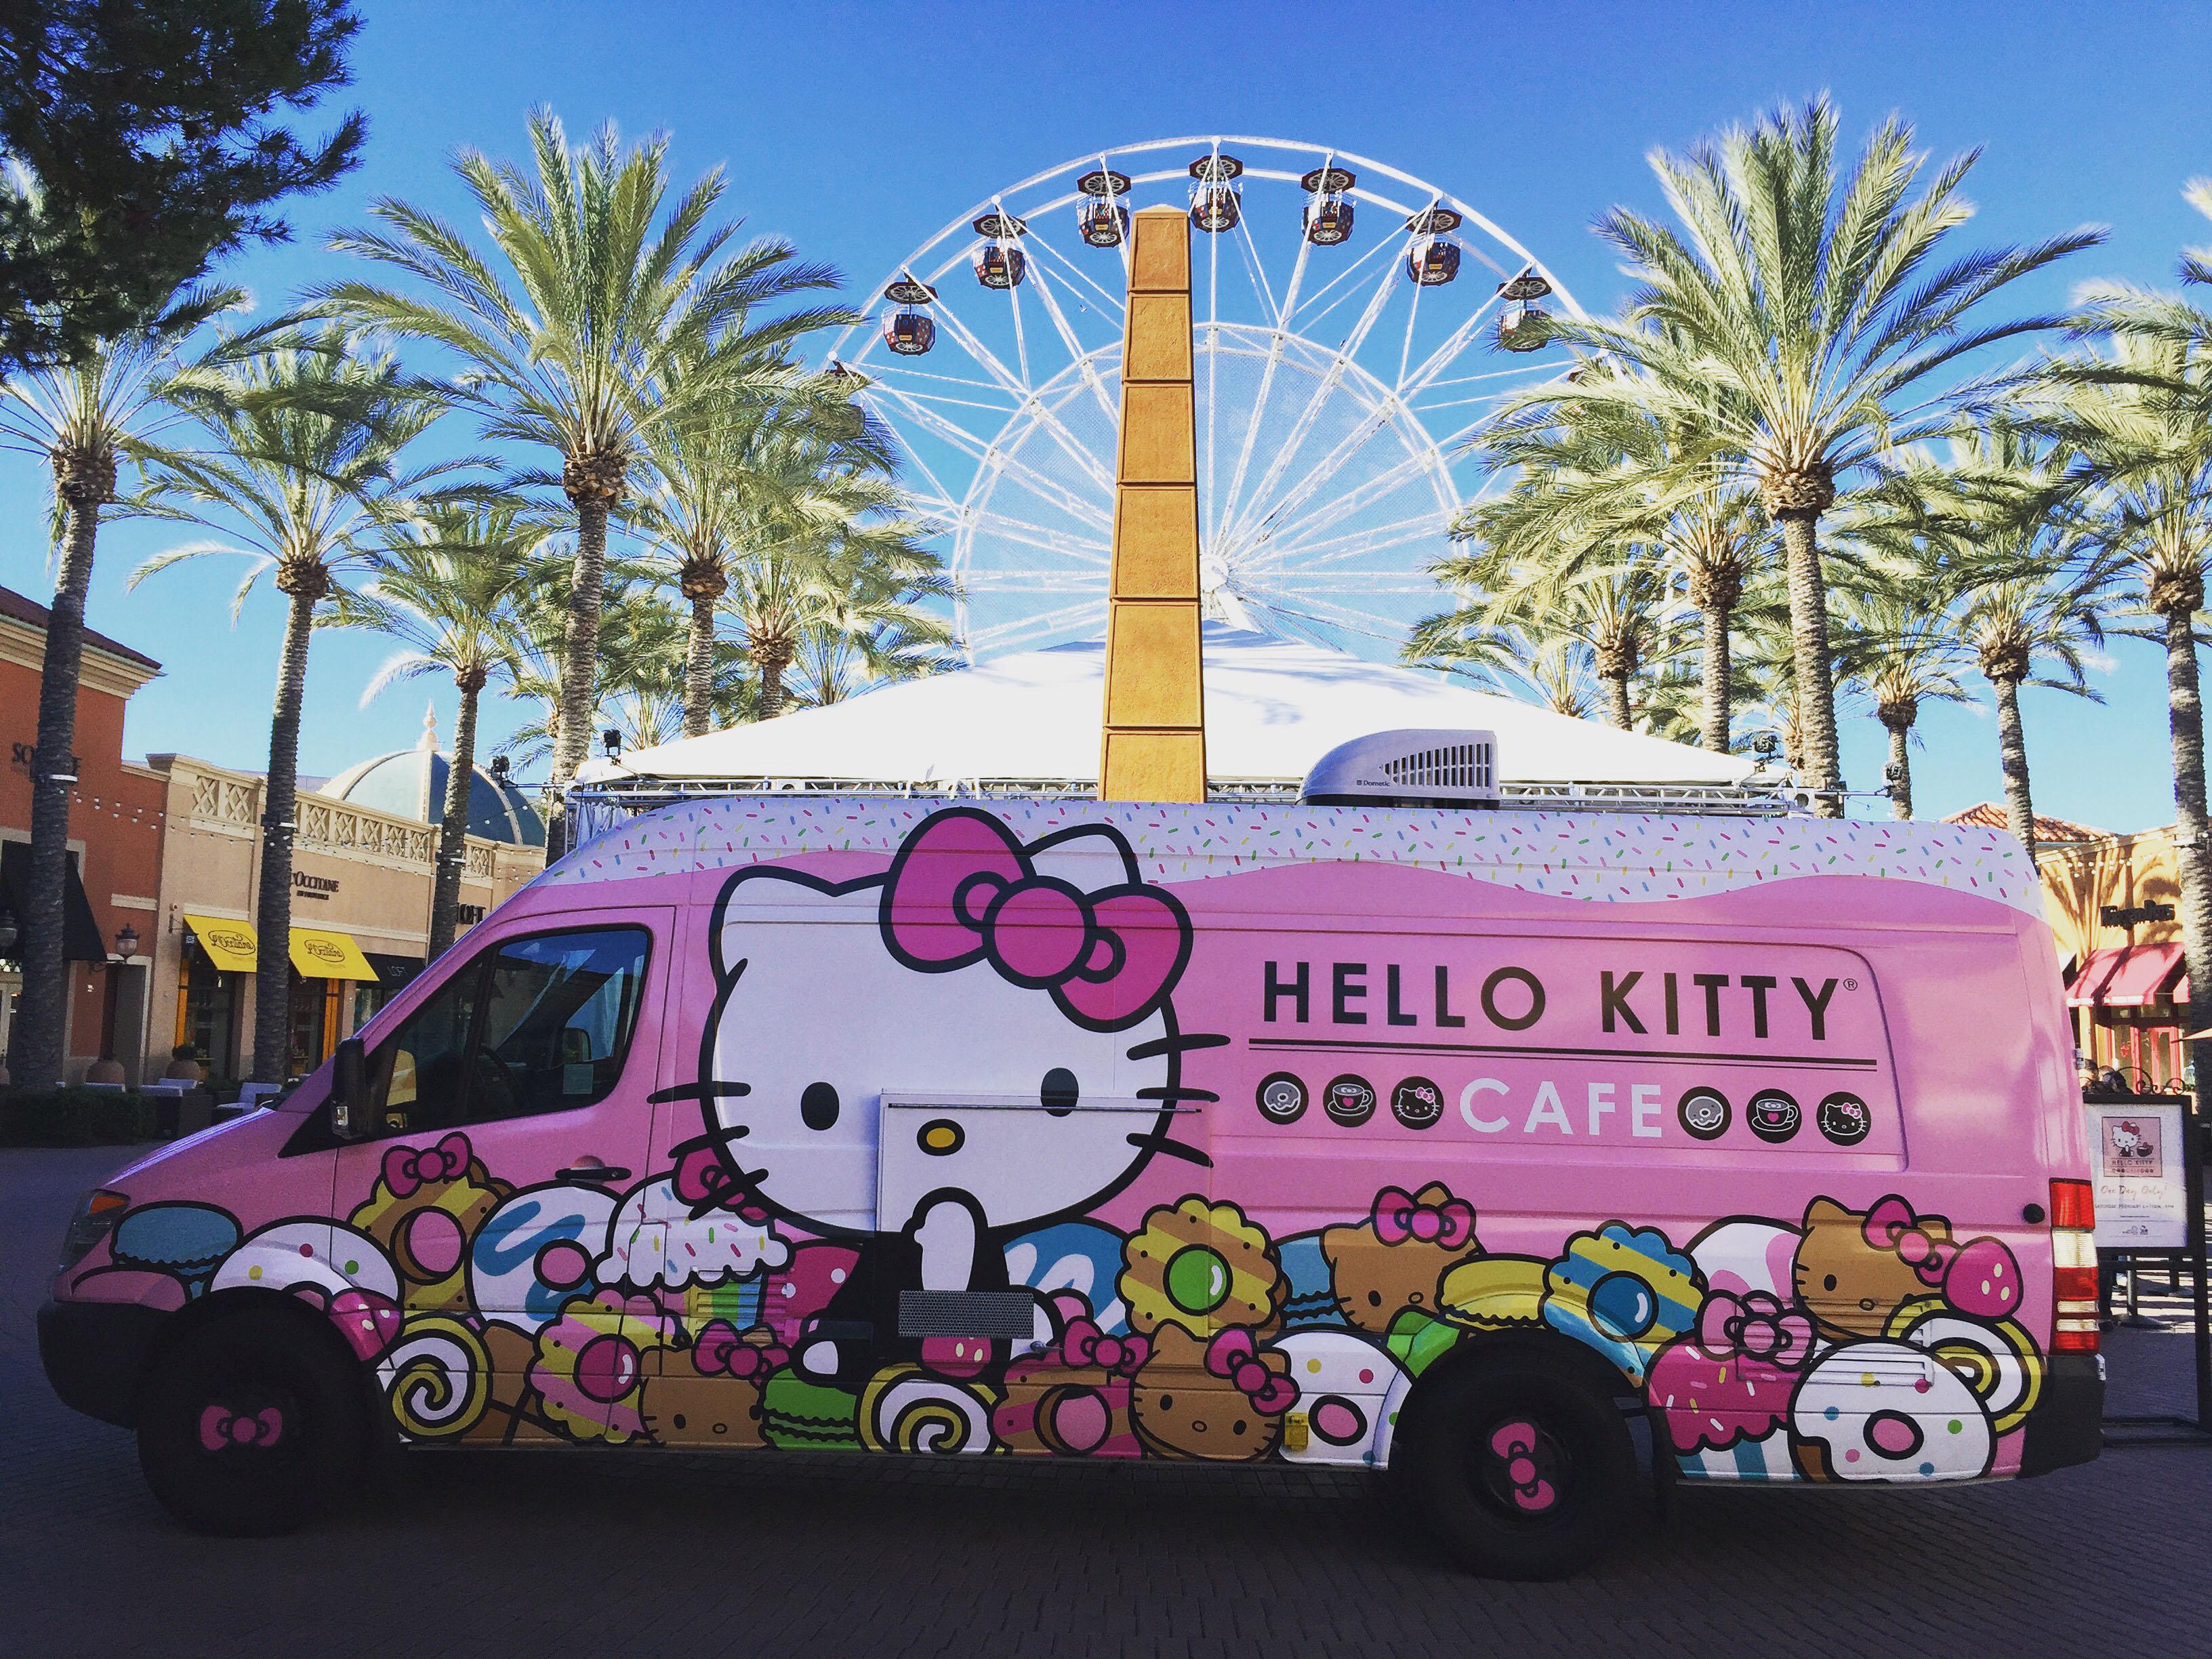 Hello Kitty Cafe Truck San Diego